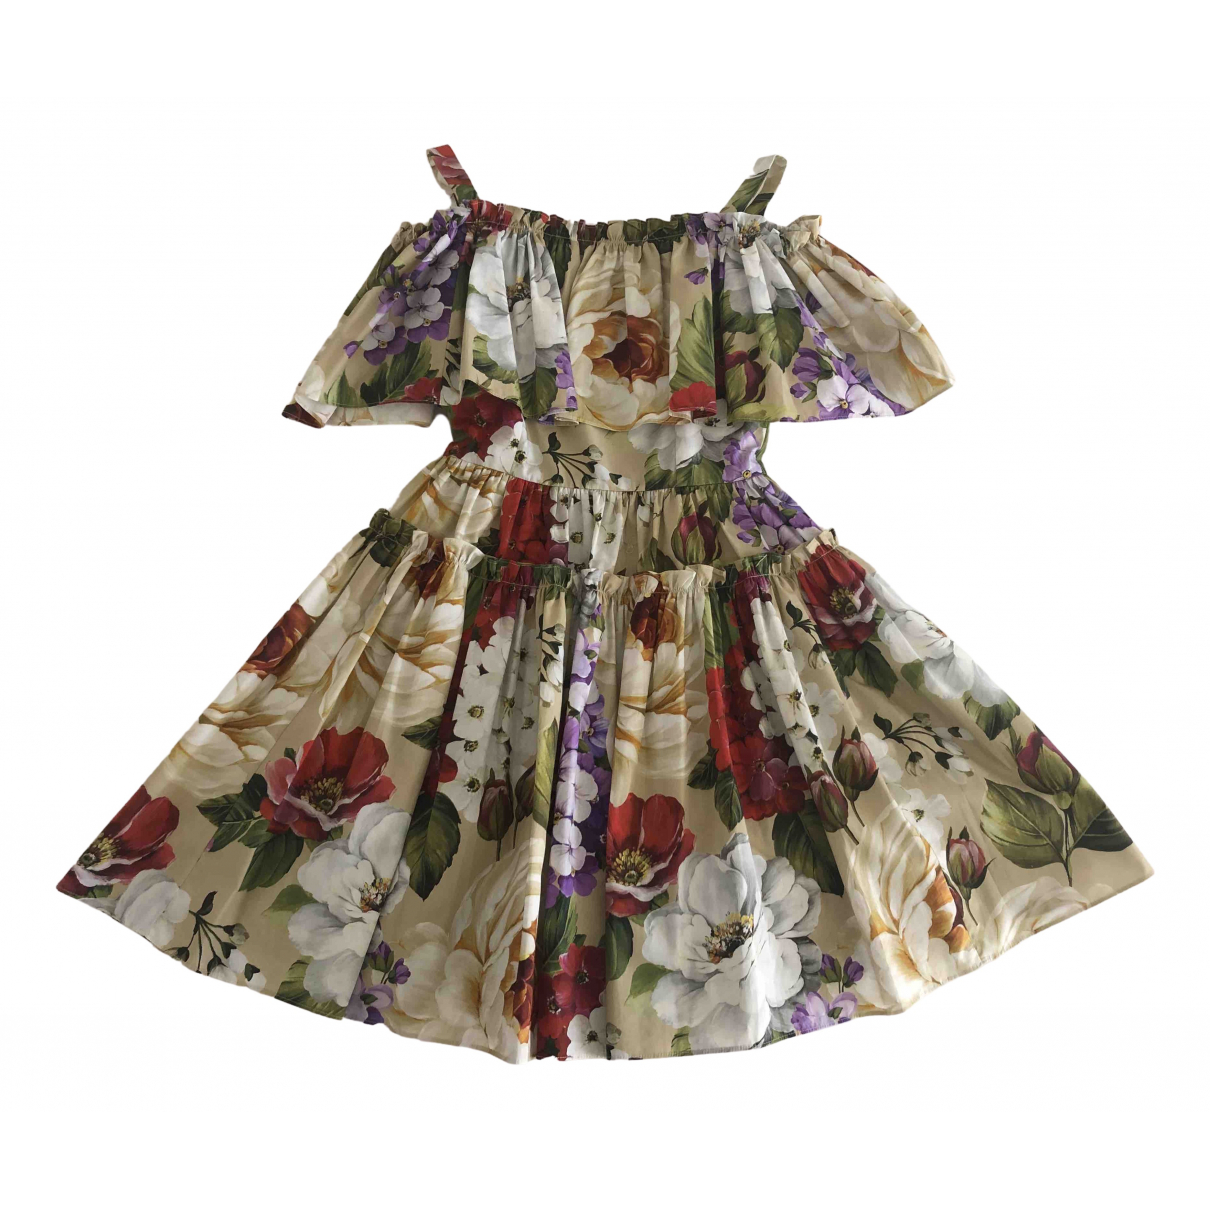 Dolce & Gabbana \N Kleid in  Beige Baumwolle